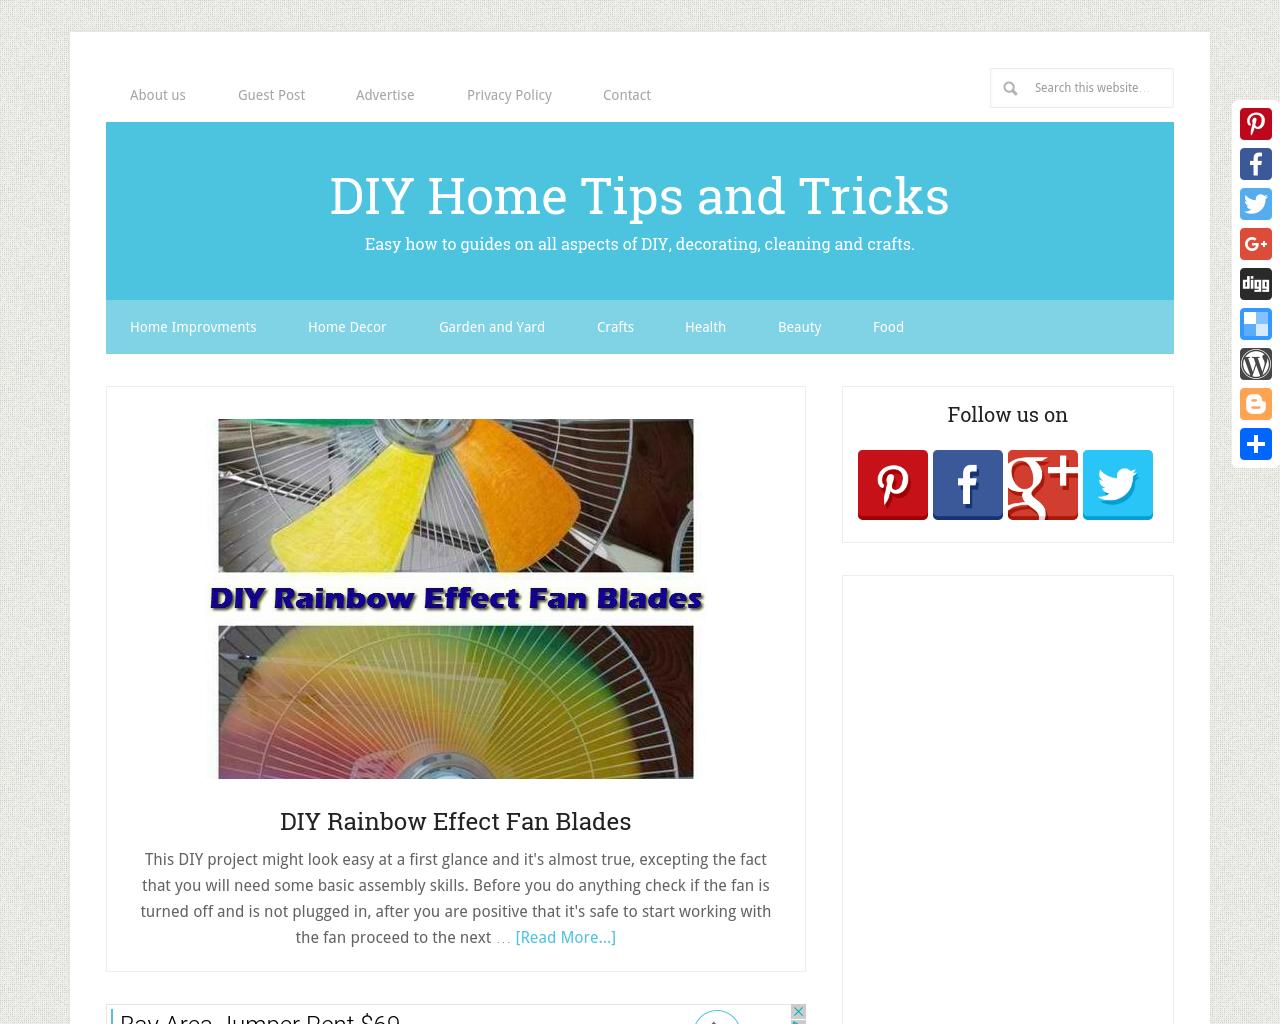 Diy-Homes-Tips-And-Tricks-Advertising-Reviews-Pricing